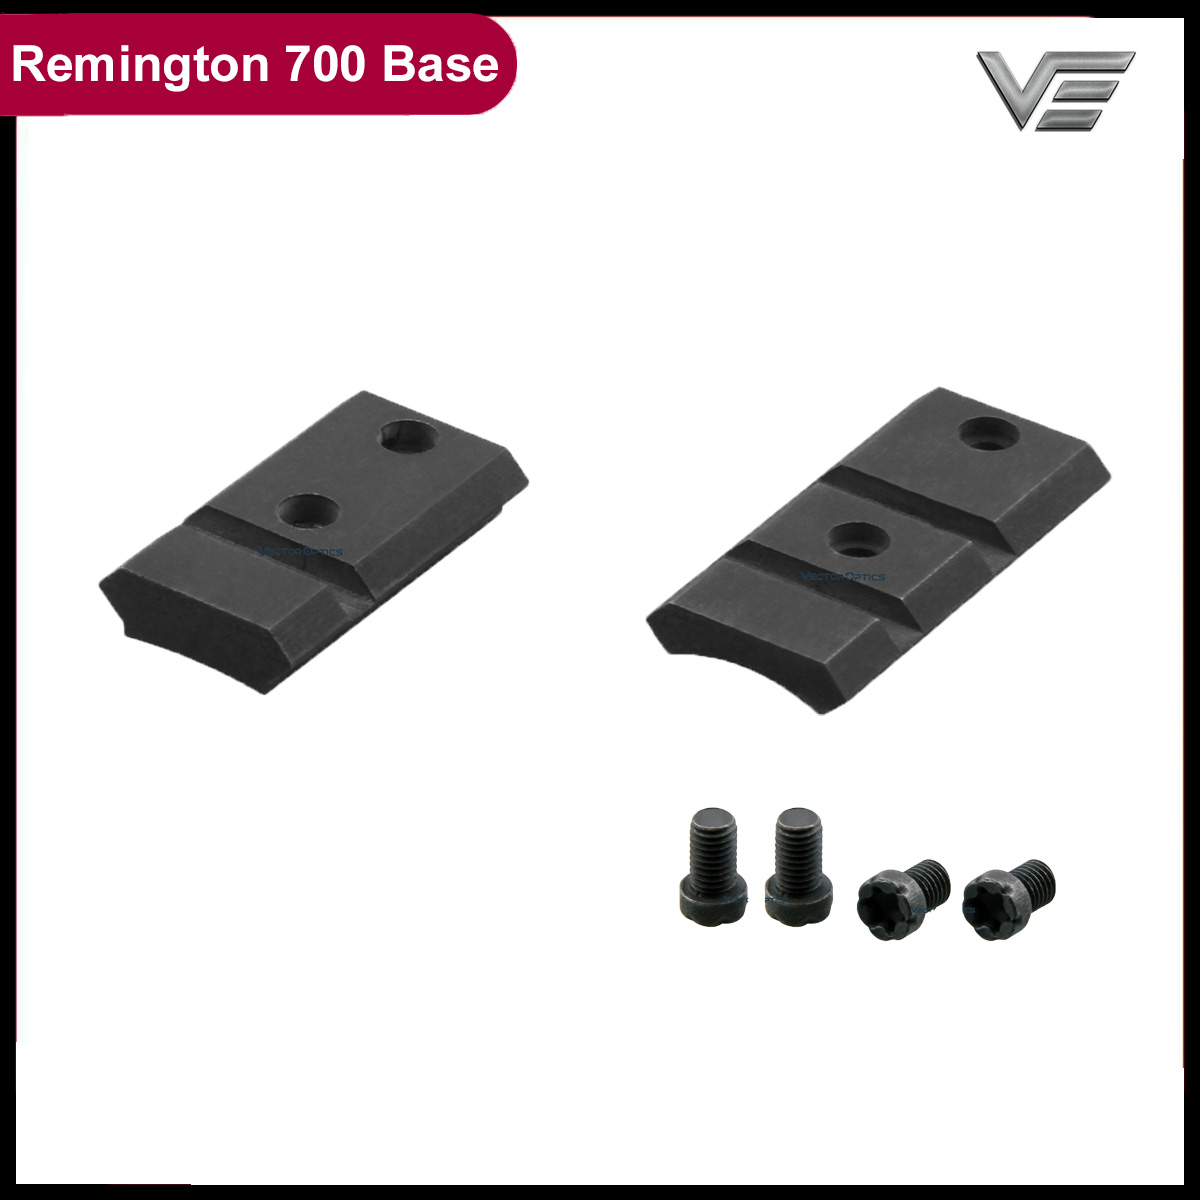 Vector Optics Remington 700 Picatinny Mount Base Short Long Steel Made 21mm Rail